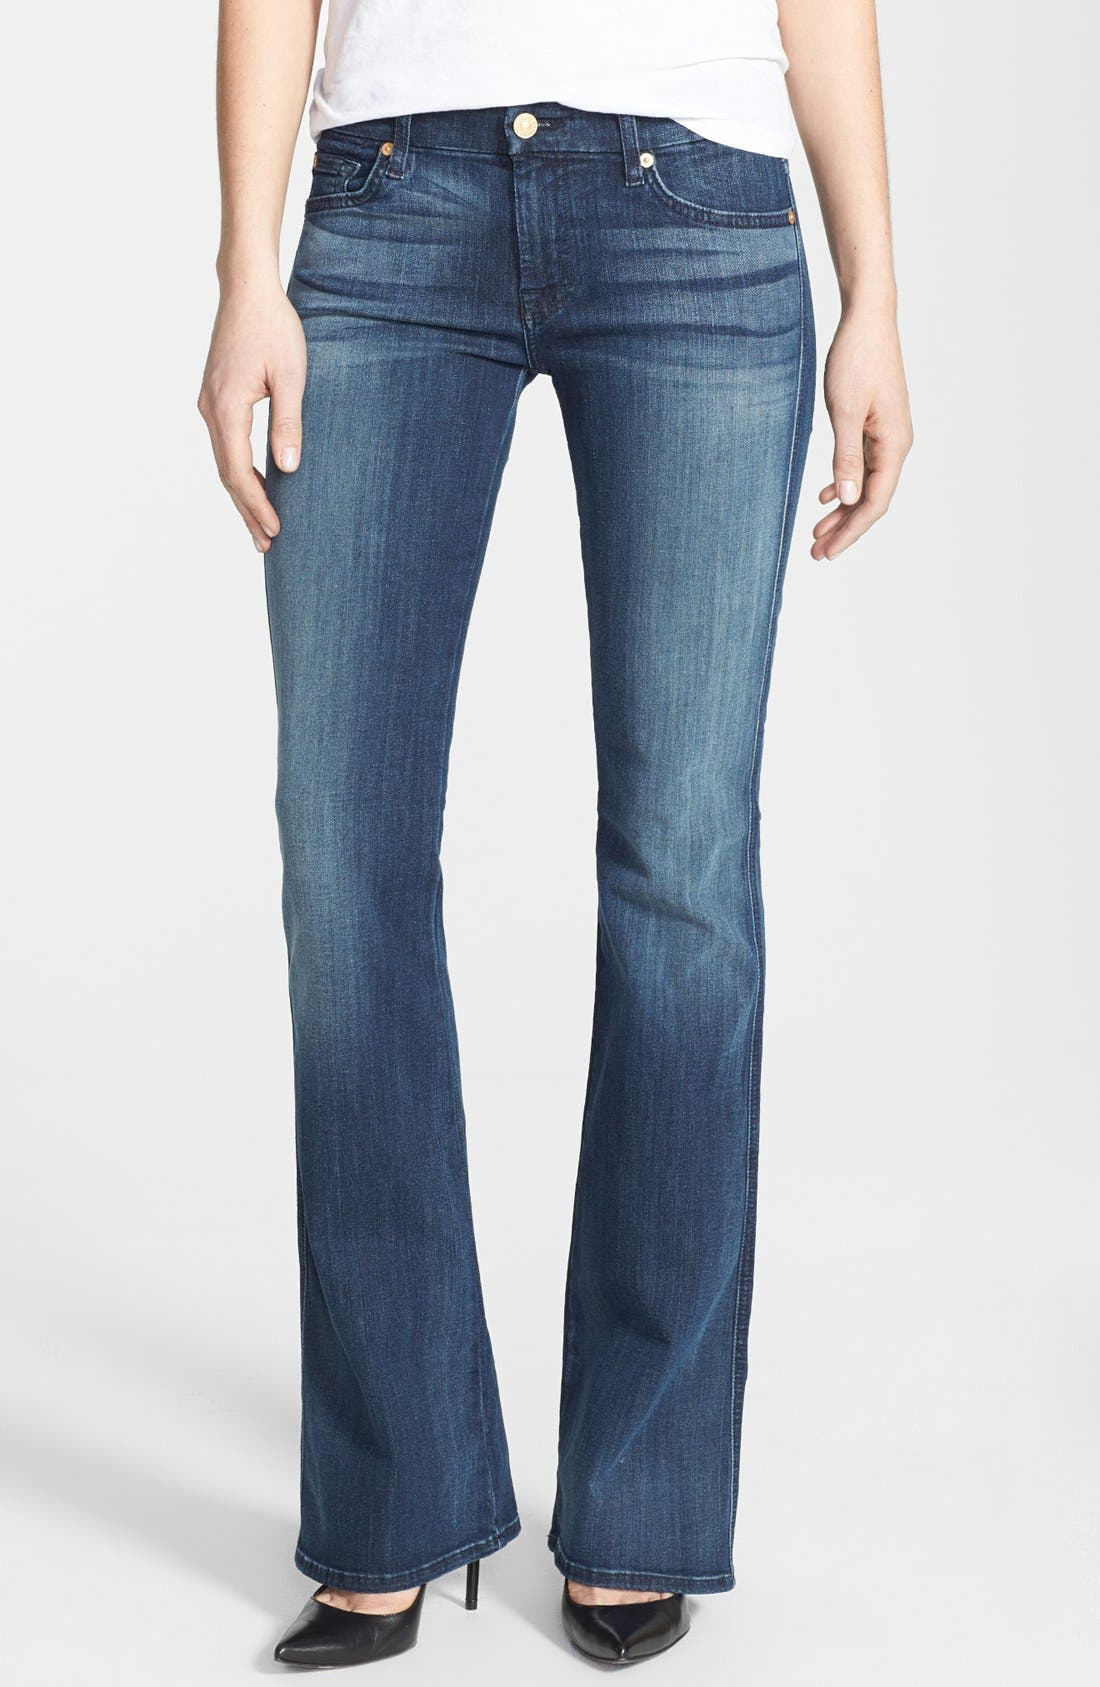 Alternate Image 1 Selected - 7 For All Mankind® 'A-Pocket' Bootcut Jeans (Dark Destroy)